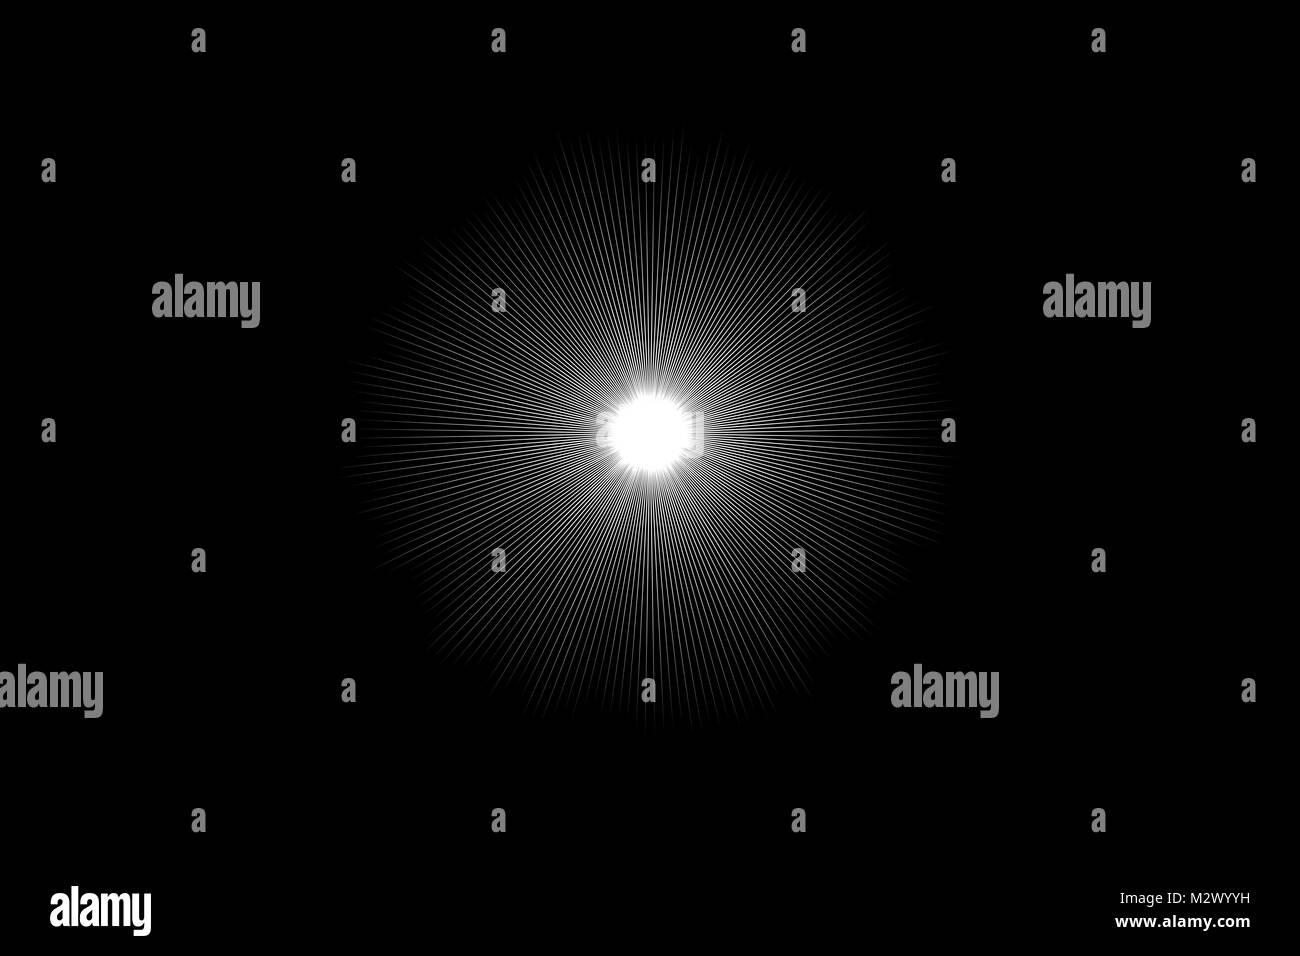 Abstract radiating white light background on black - Stock Image